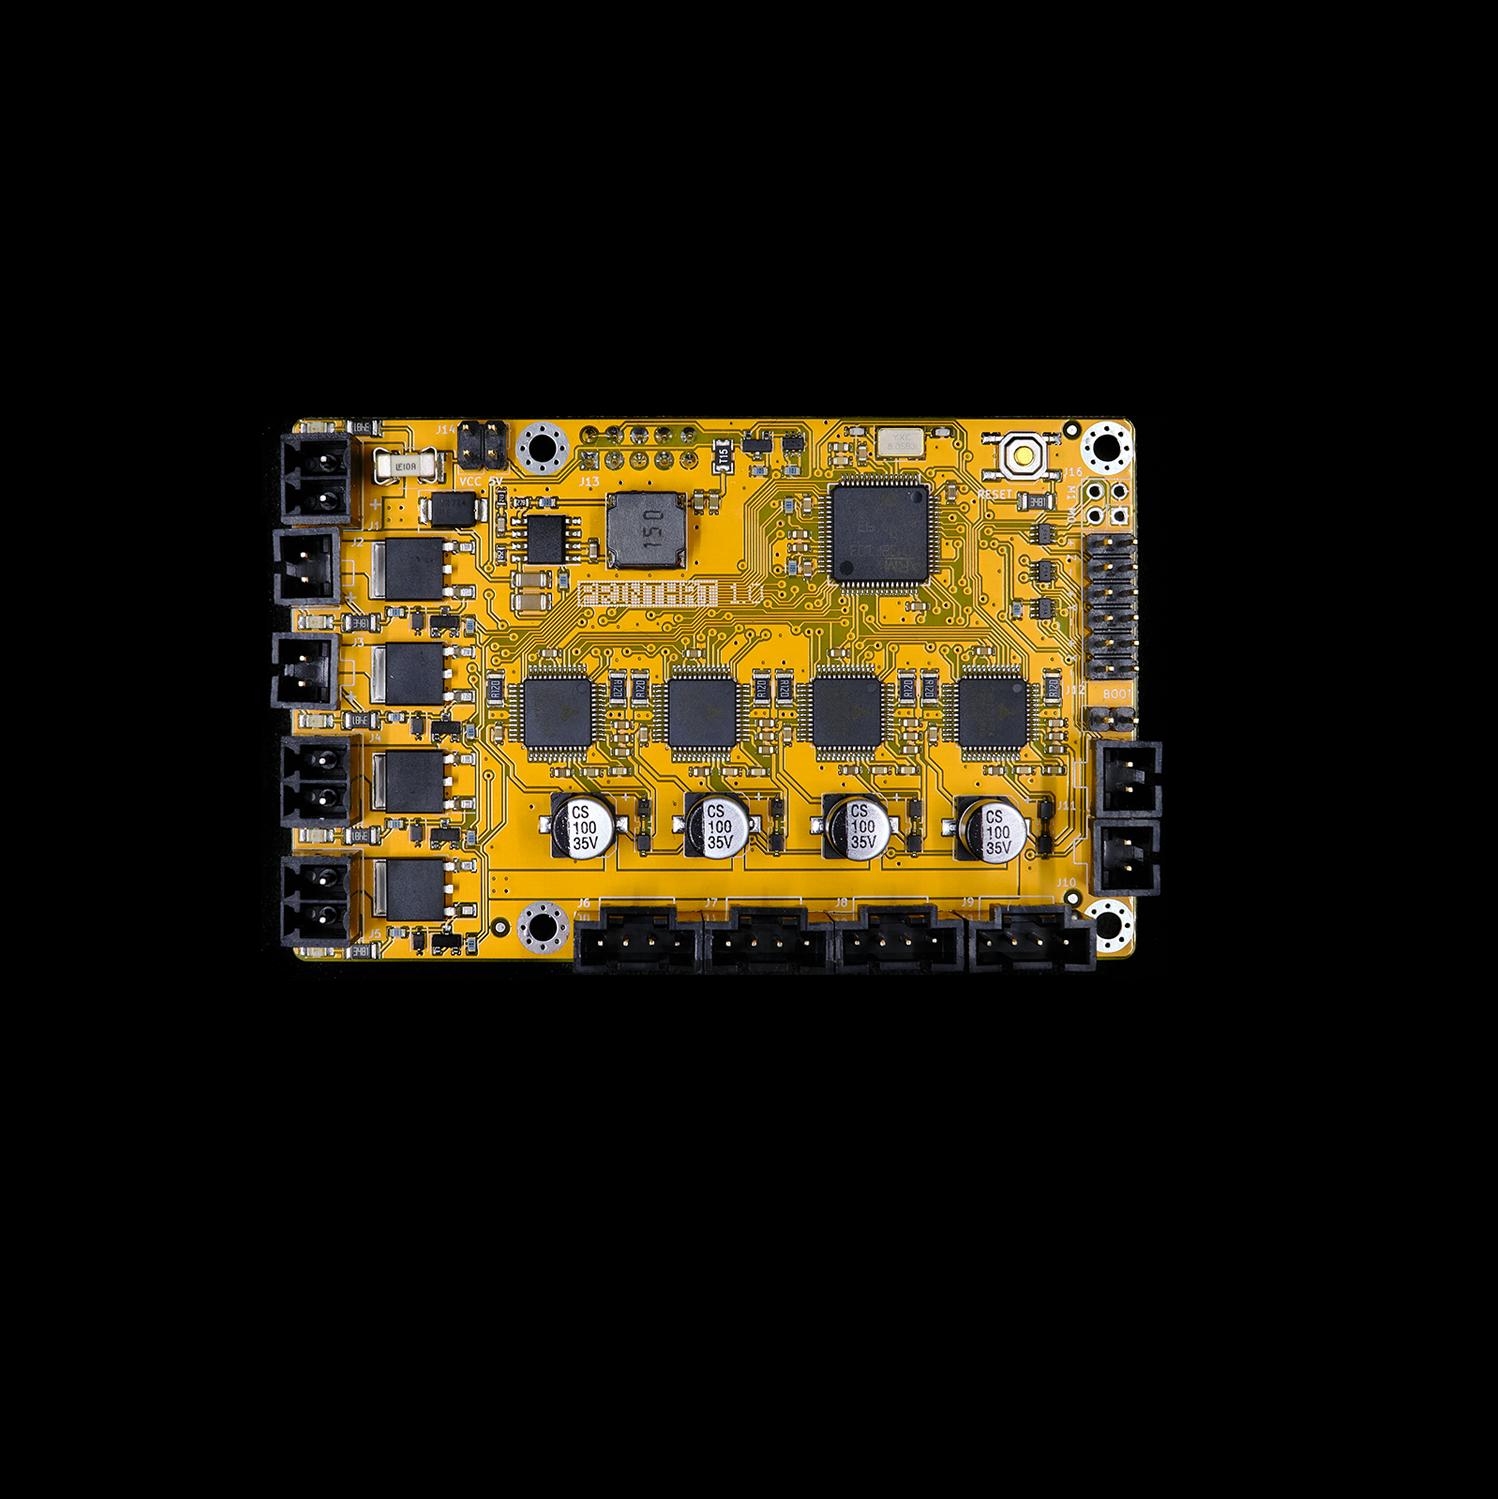 PrintHat v1 - 32-bit motor controller board for Raspberry Pi | 3D